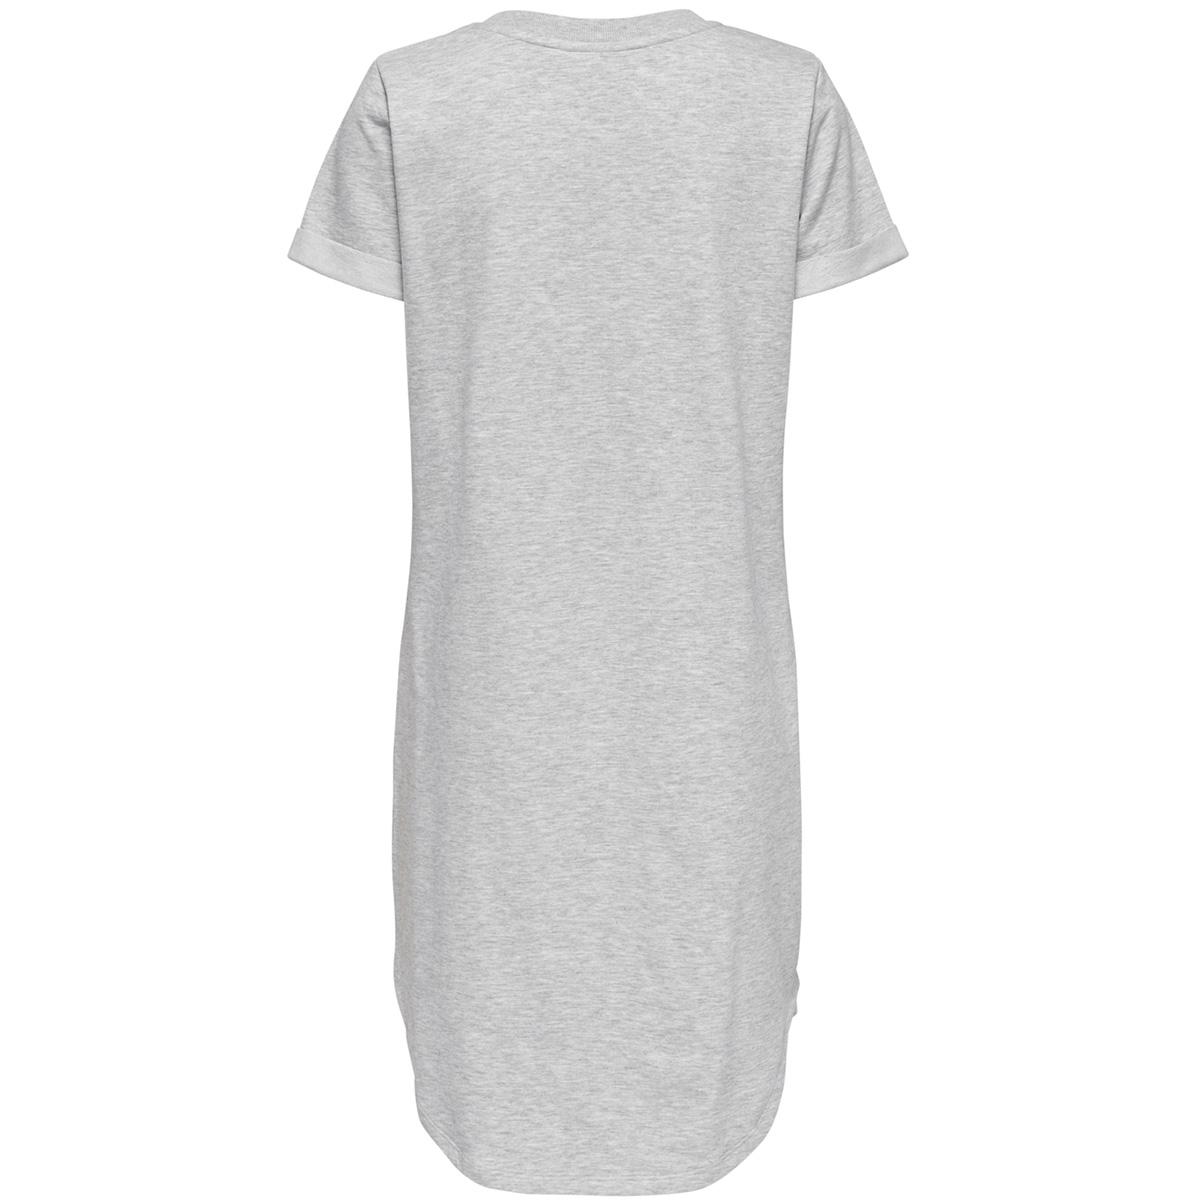 jdyivy s/s dress jrs 15174793 jacqueline de yong jurk light grey melange